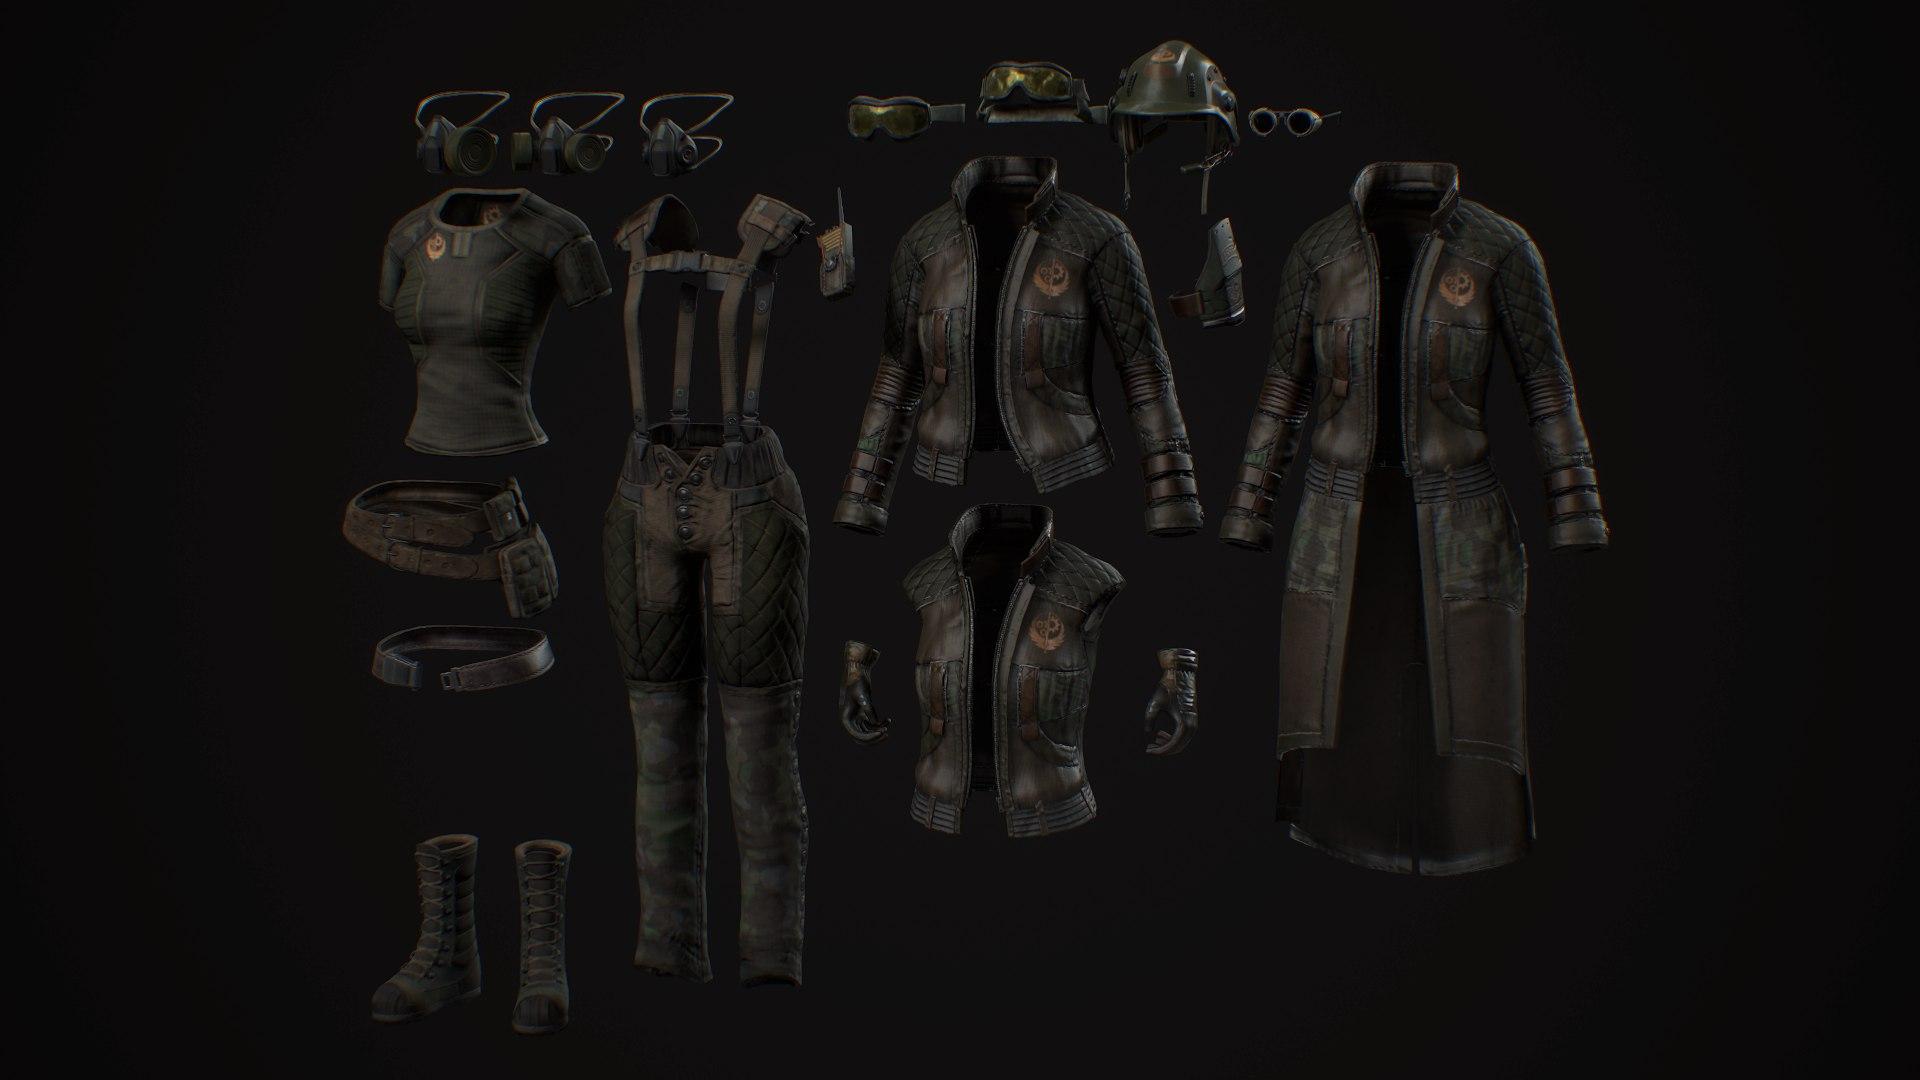 CROSS_BrotherhoodRecon Fallout4